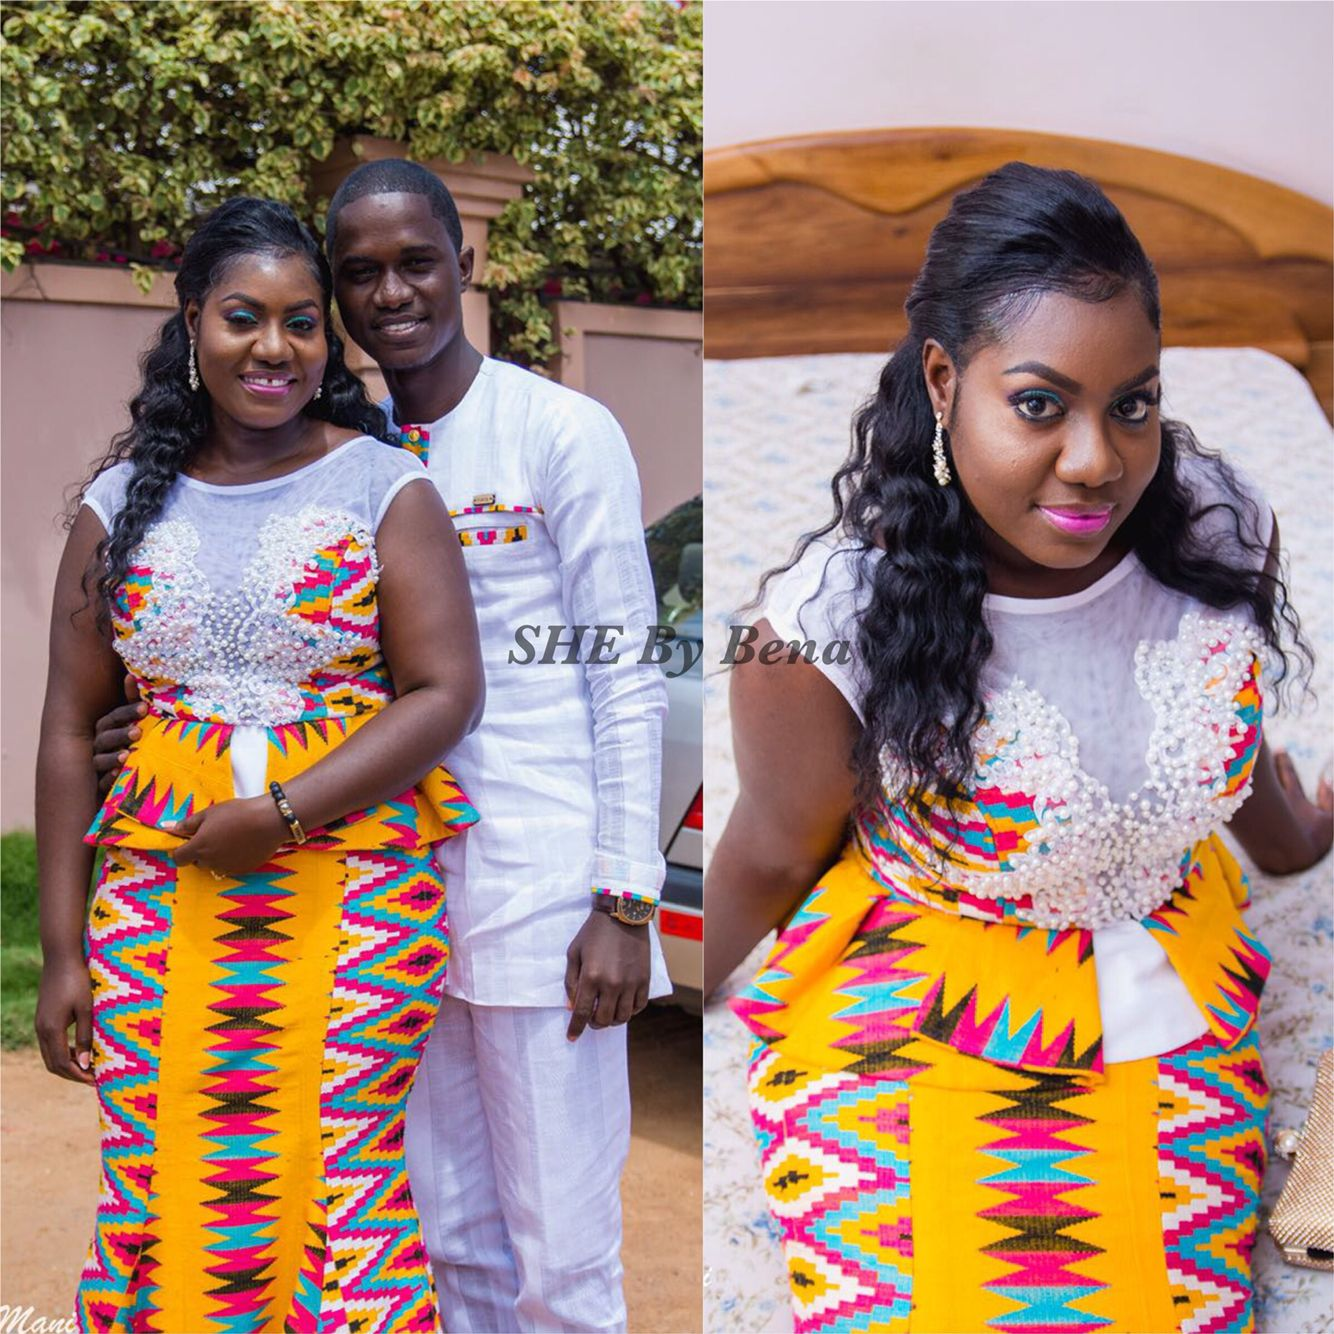 Pin by sheelah garbrah on she by bena pinterest for Traditional wedding dress styles